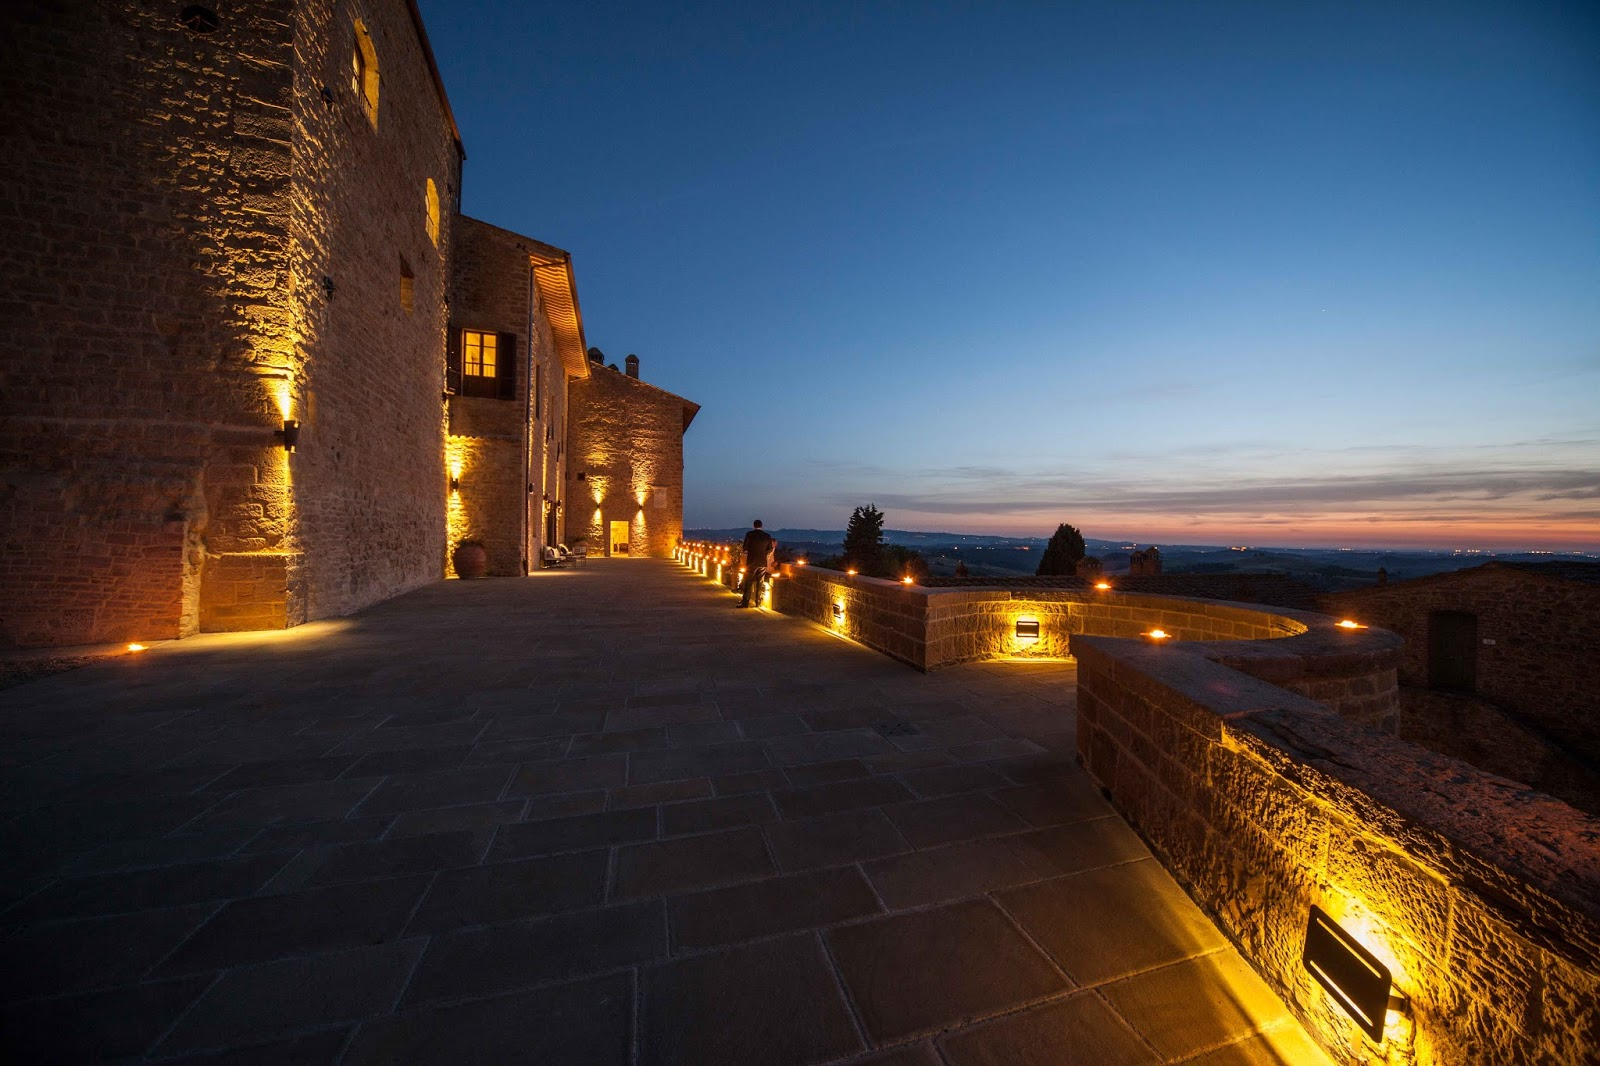 Matrimonio D Inverno Location Toscana : Matrimonio invernale sposarsi in inverno toscana resort